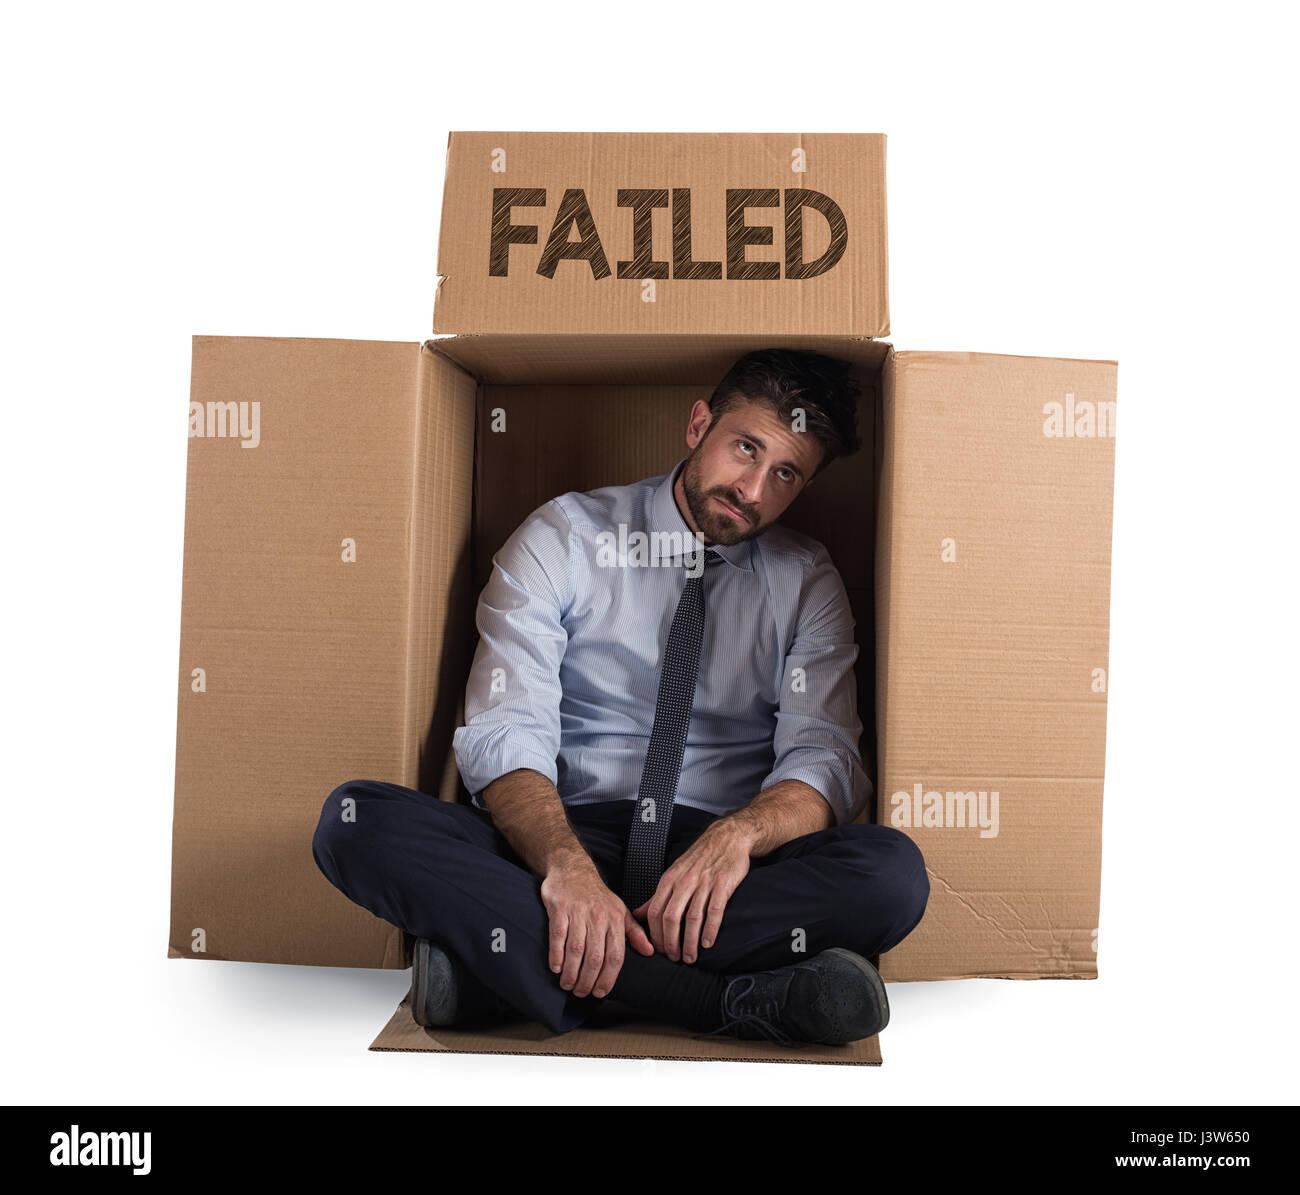 Failed businessman on the street - Stock Image